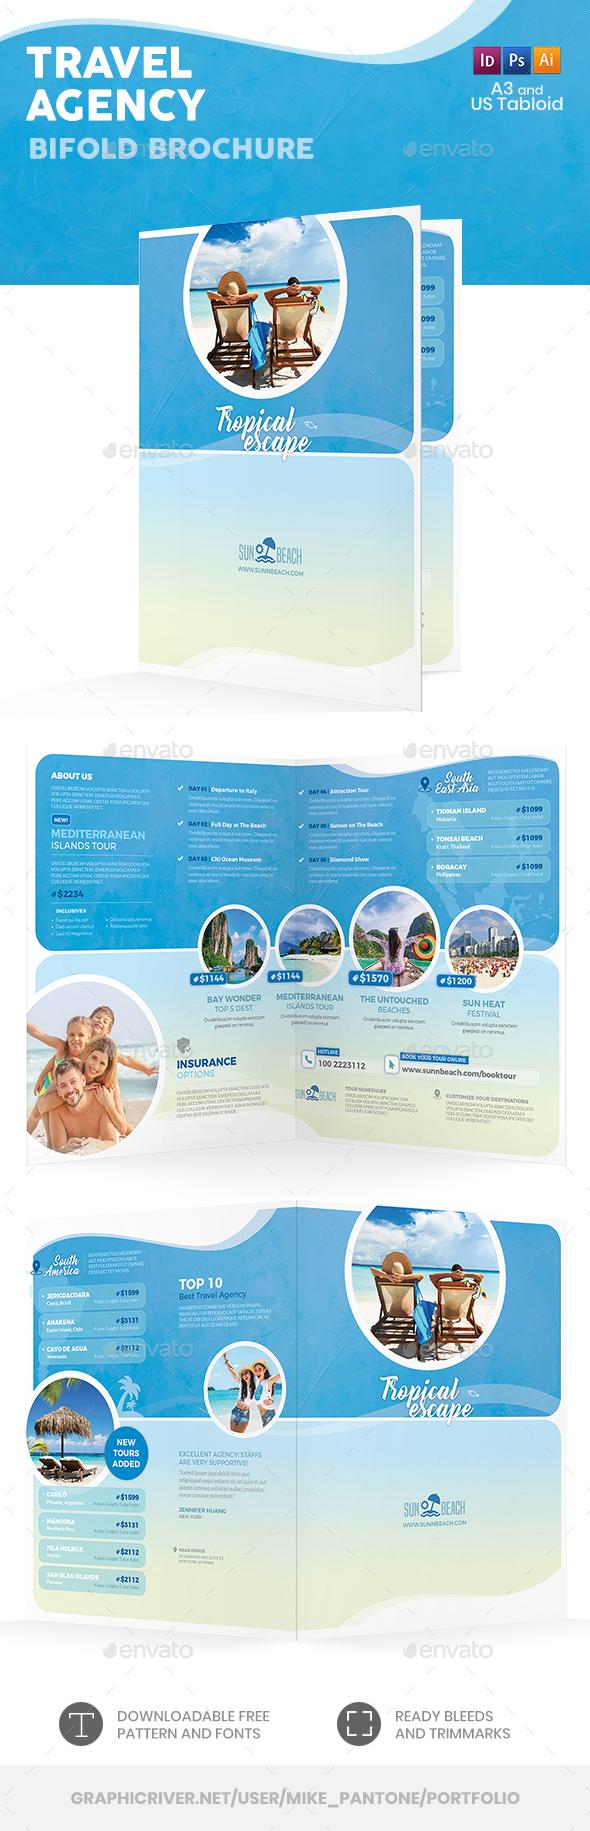 Travel Agency Bifold / Halffold Brochure 5